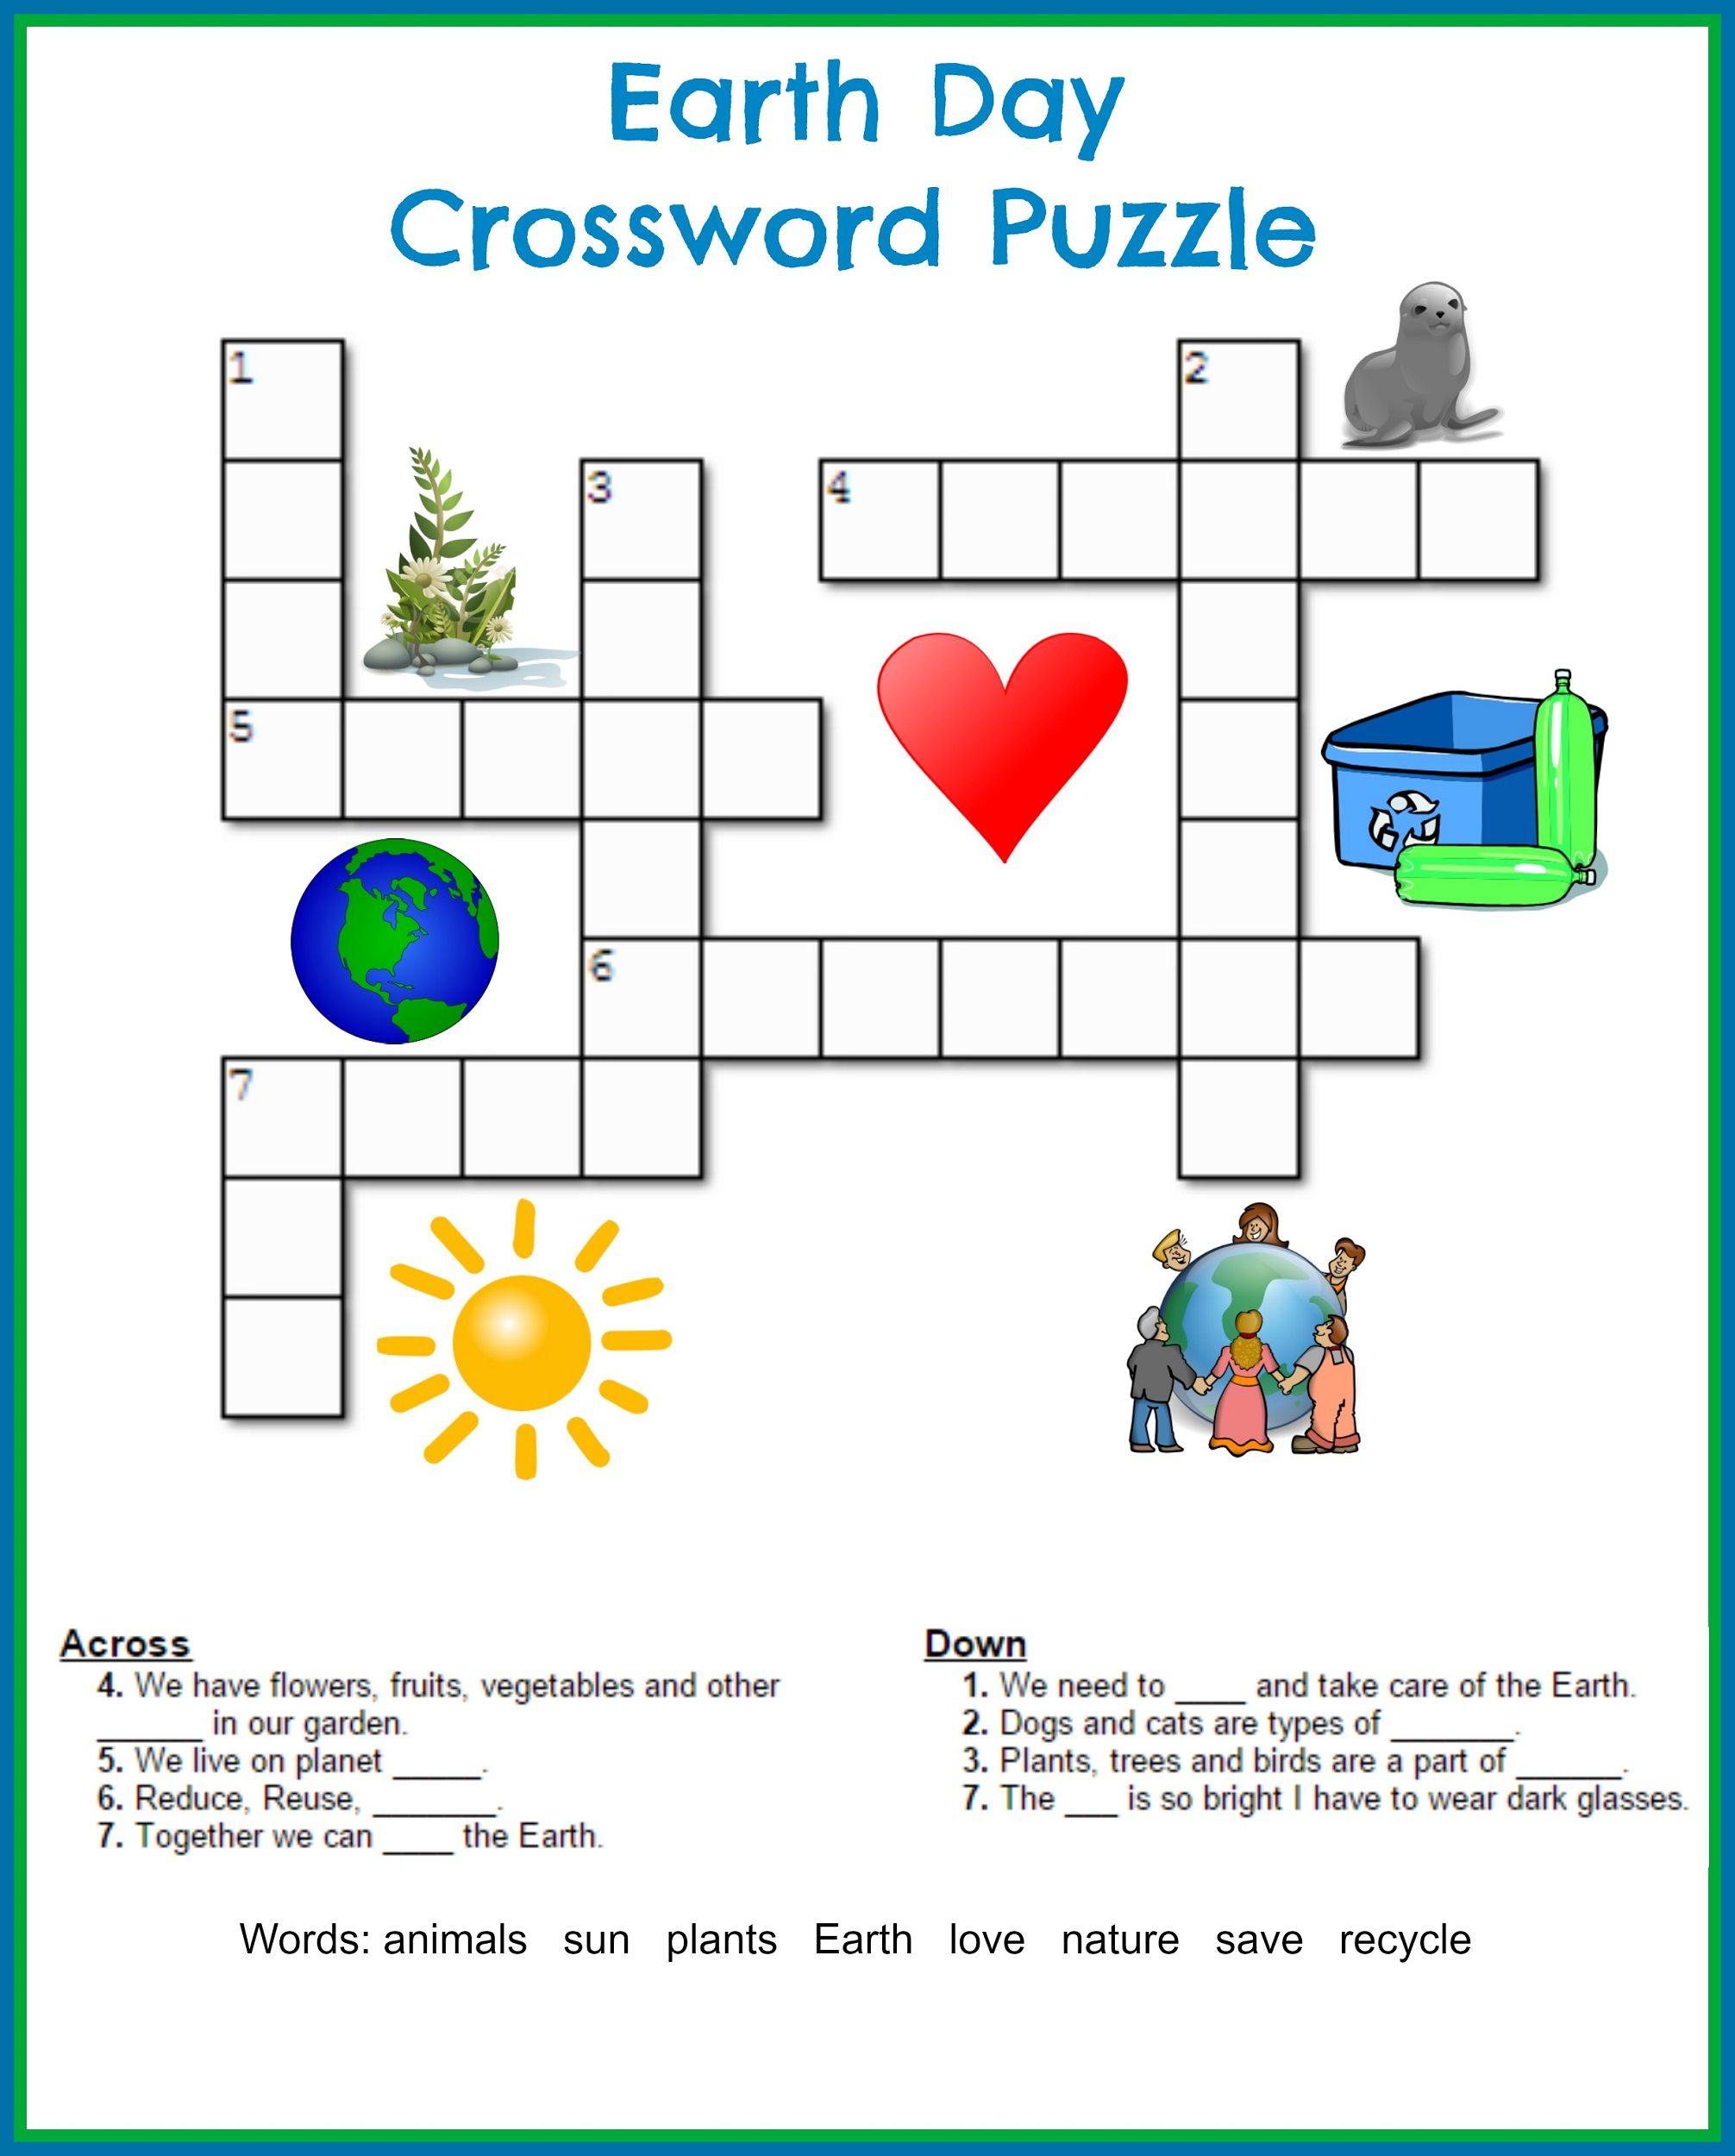 Printable Crossword Puzzles Kids | Crossword Puzzles On Earth - Printable Children's Crossword Puzzles